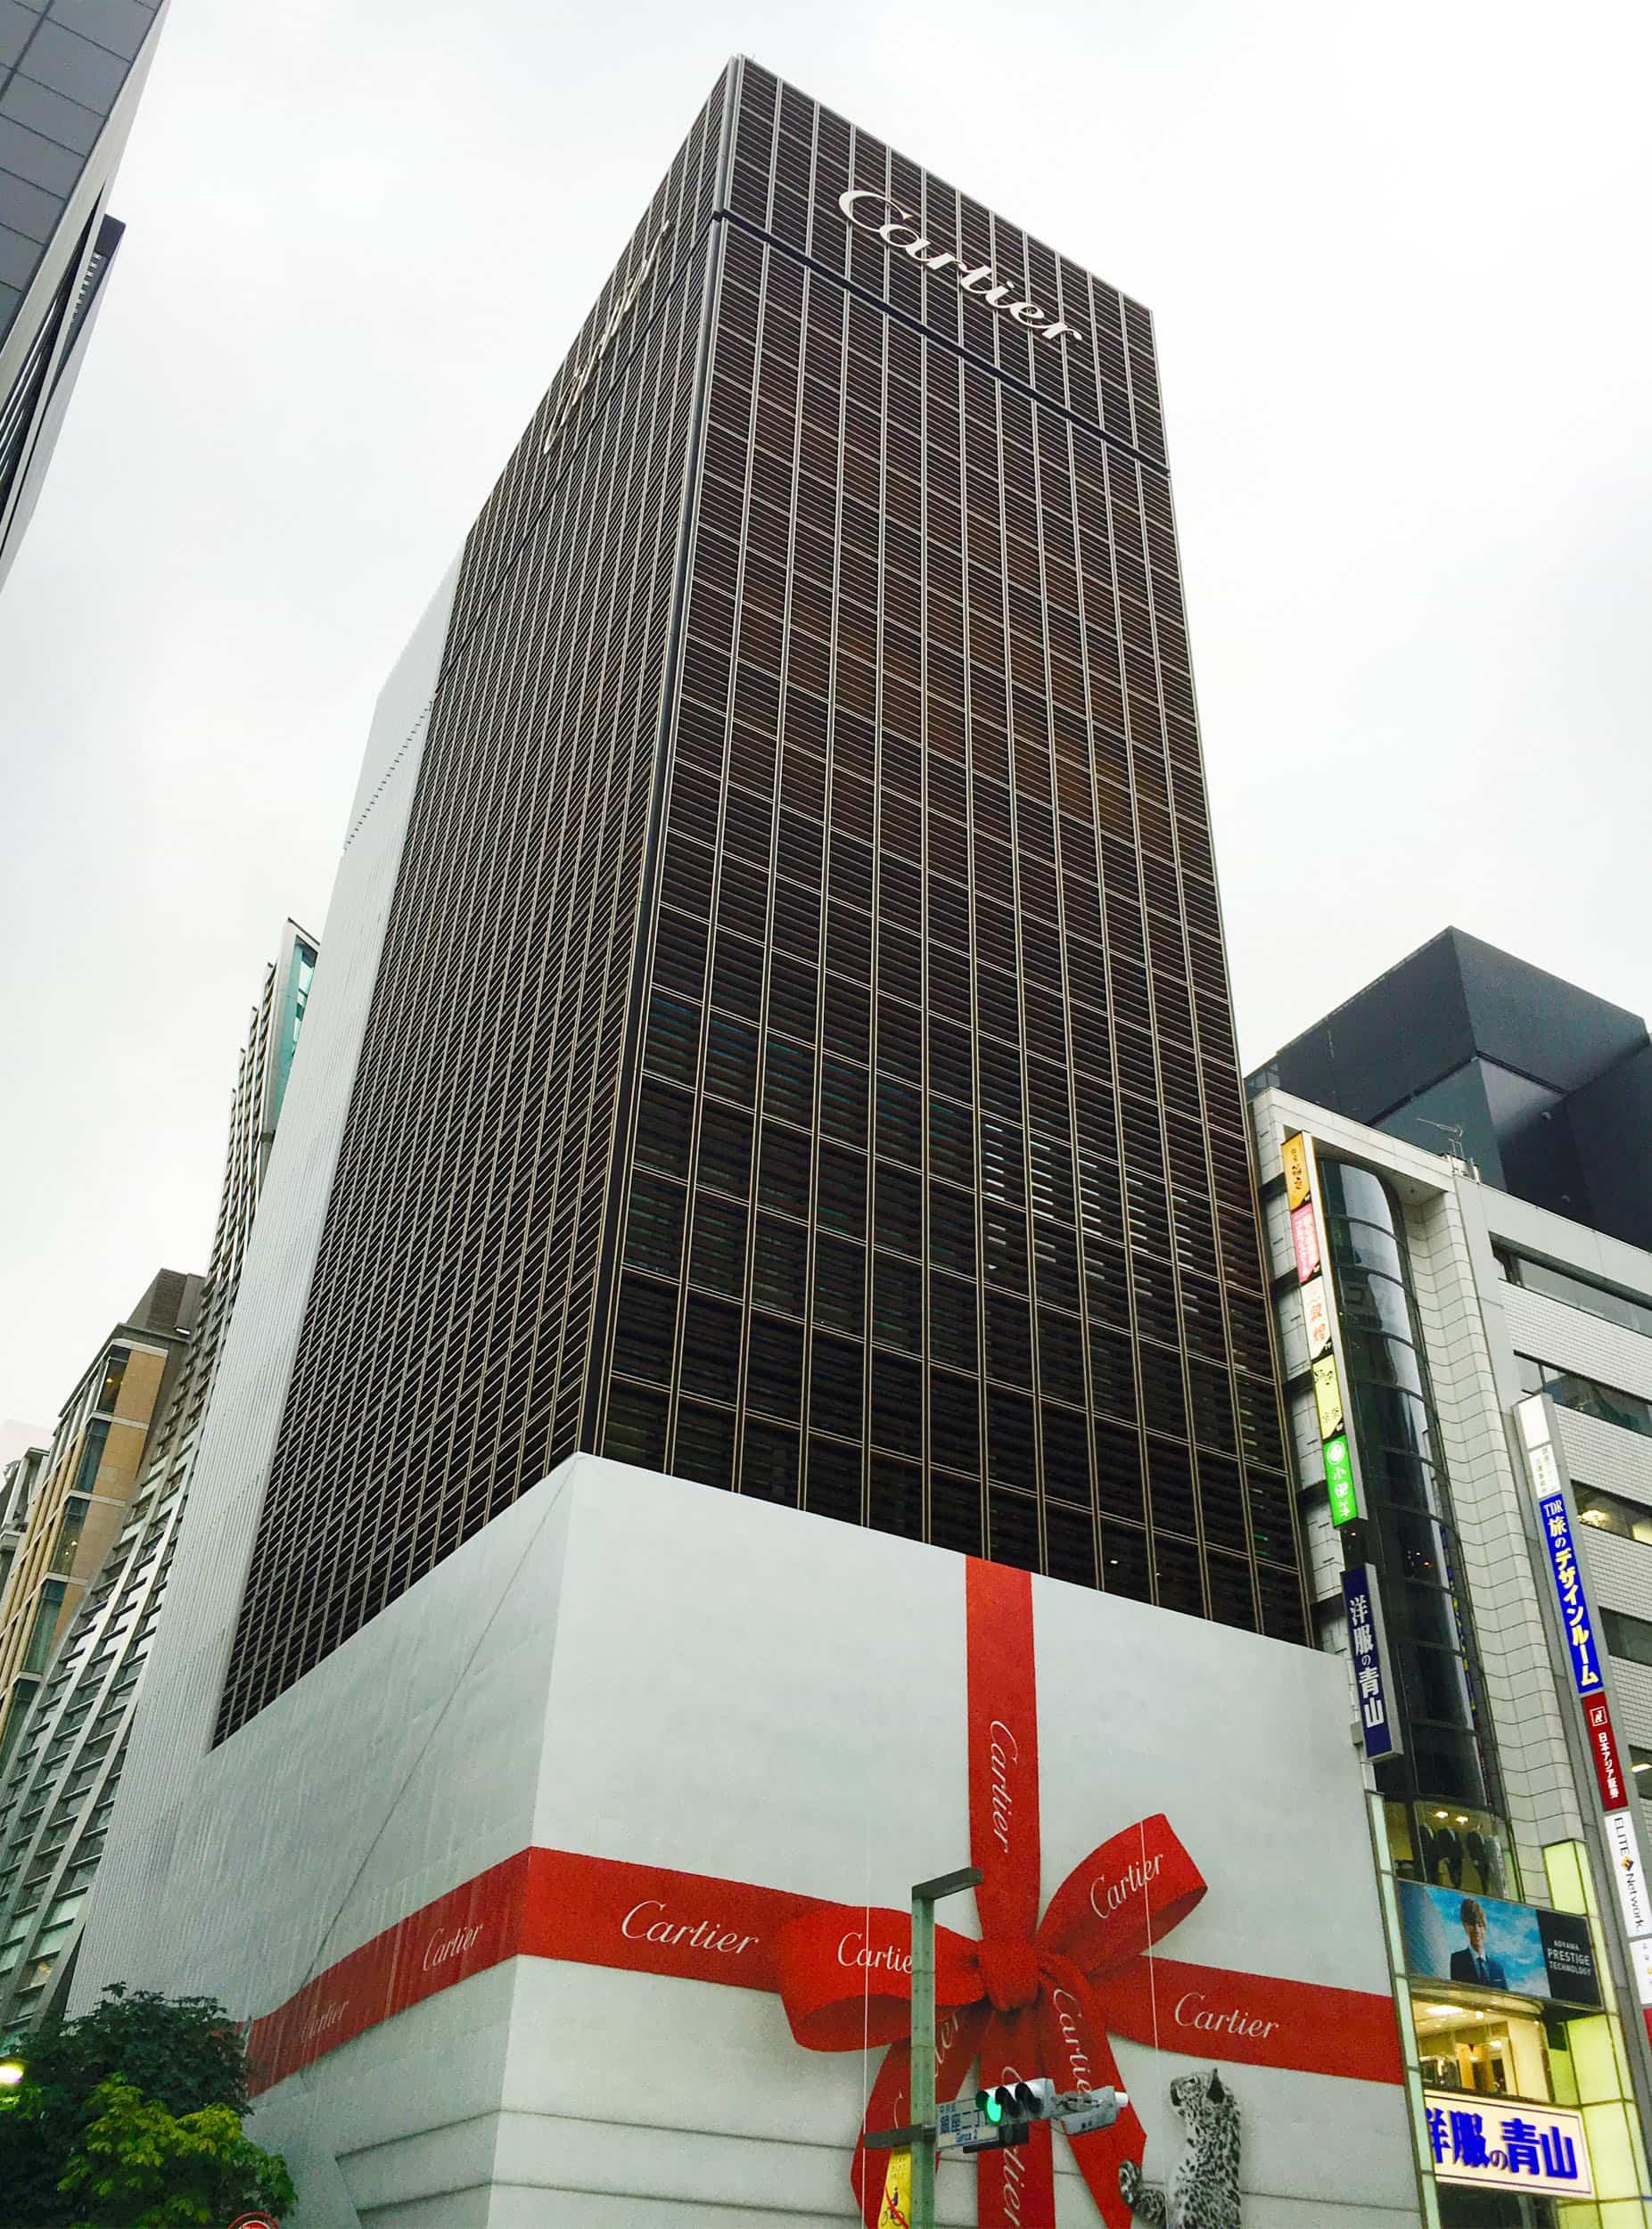 #CARTIER / TOKYO CHUO / JAPAN / 2016